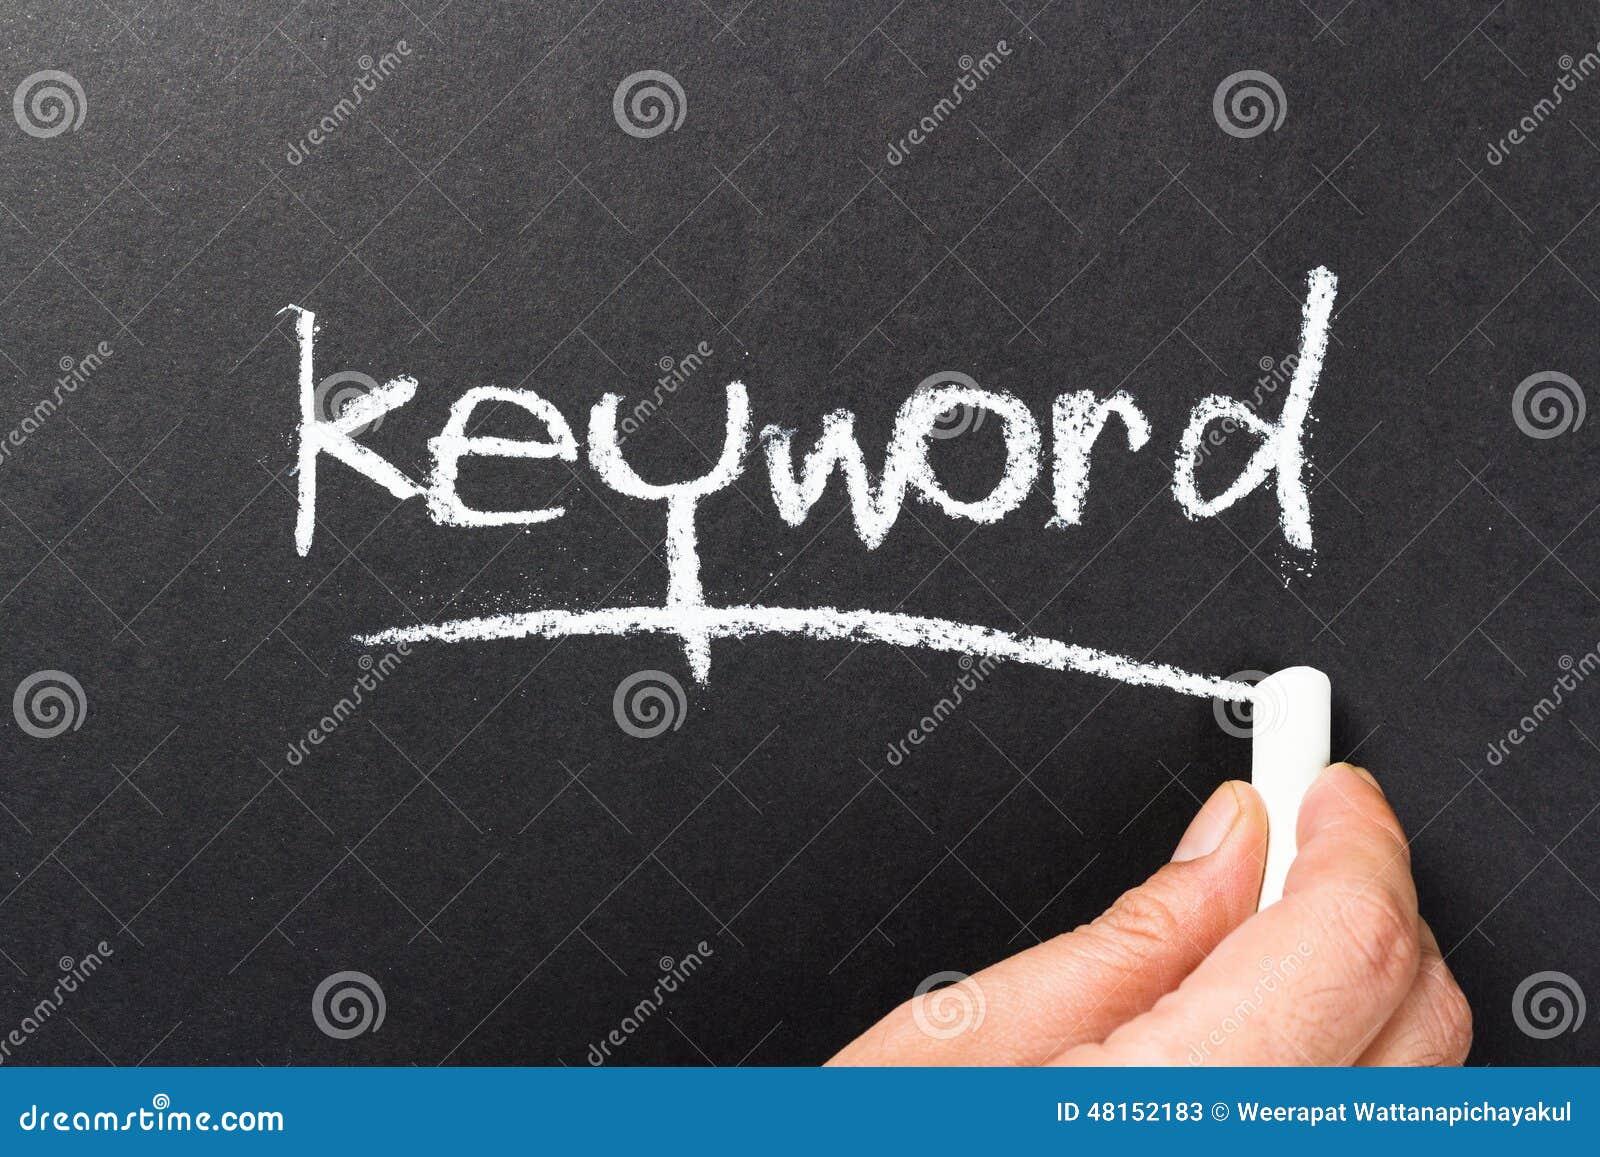 Keyword topic